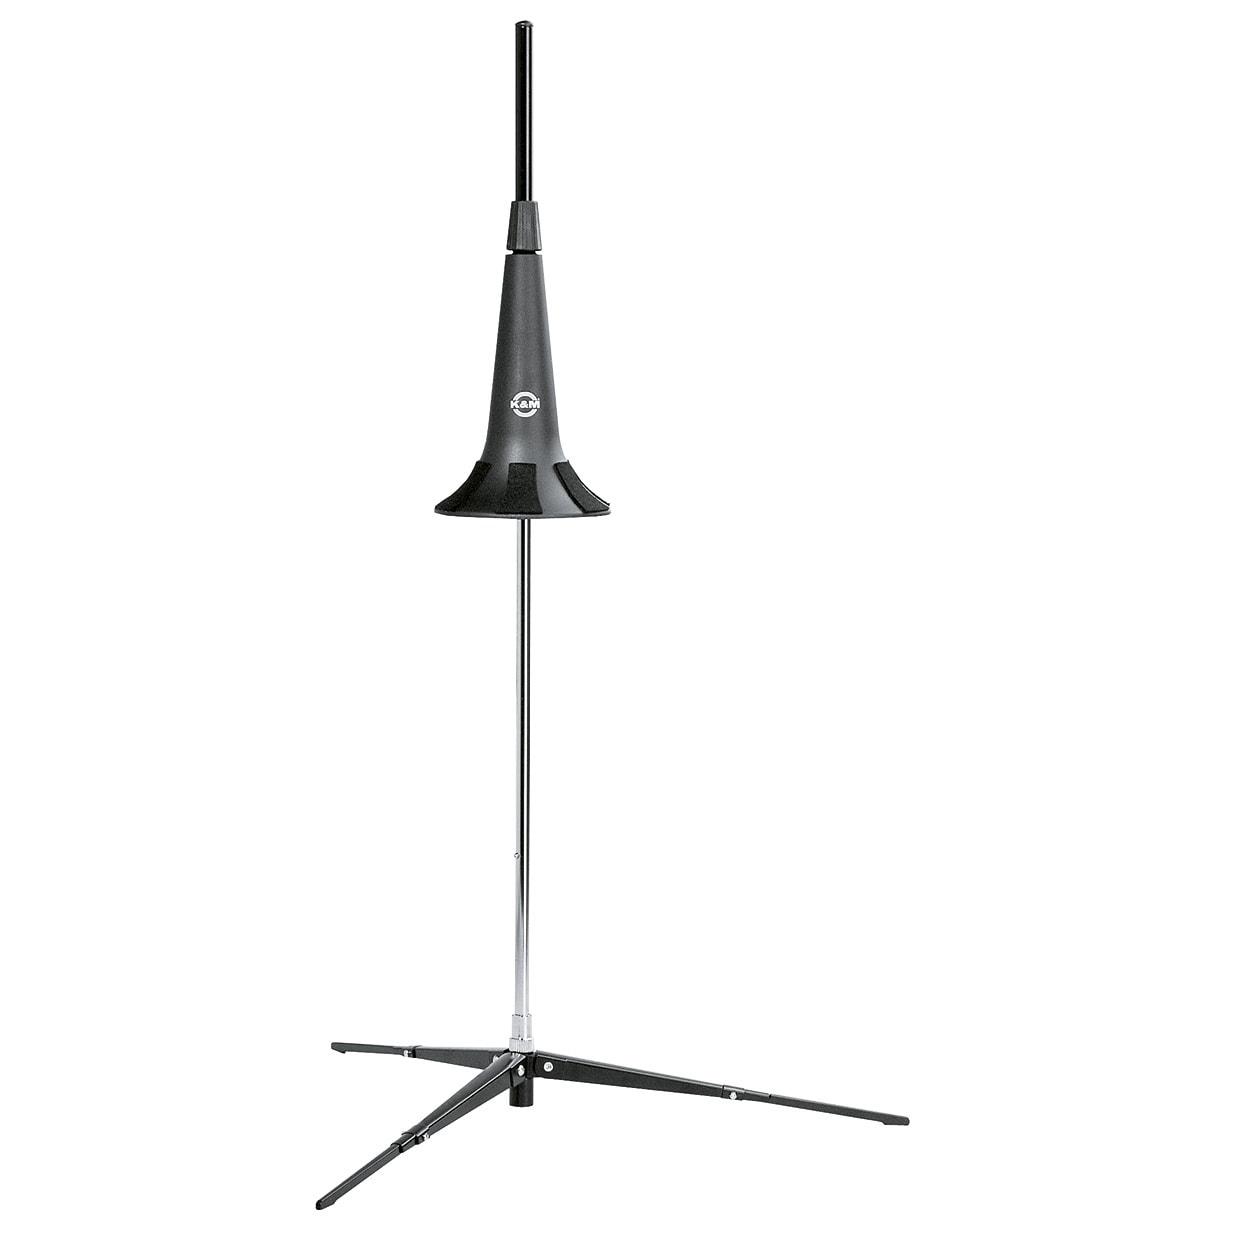 KM15270 - Trombone stand